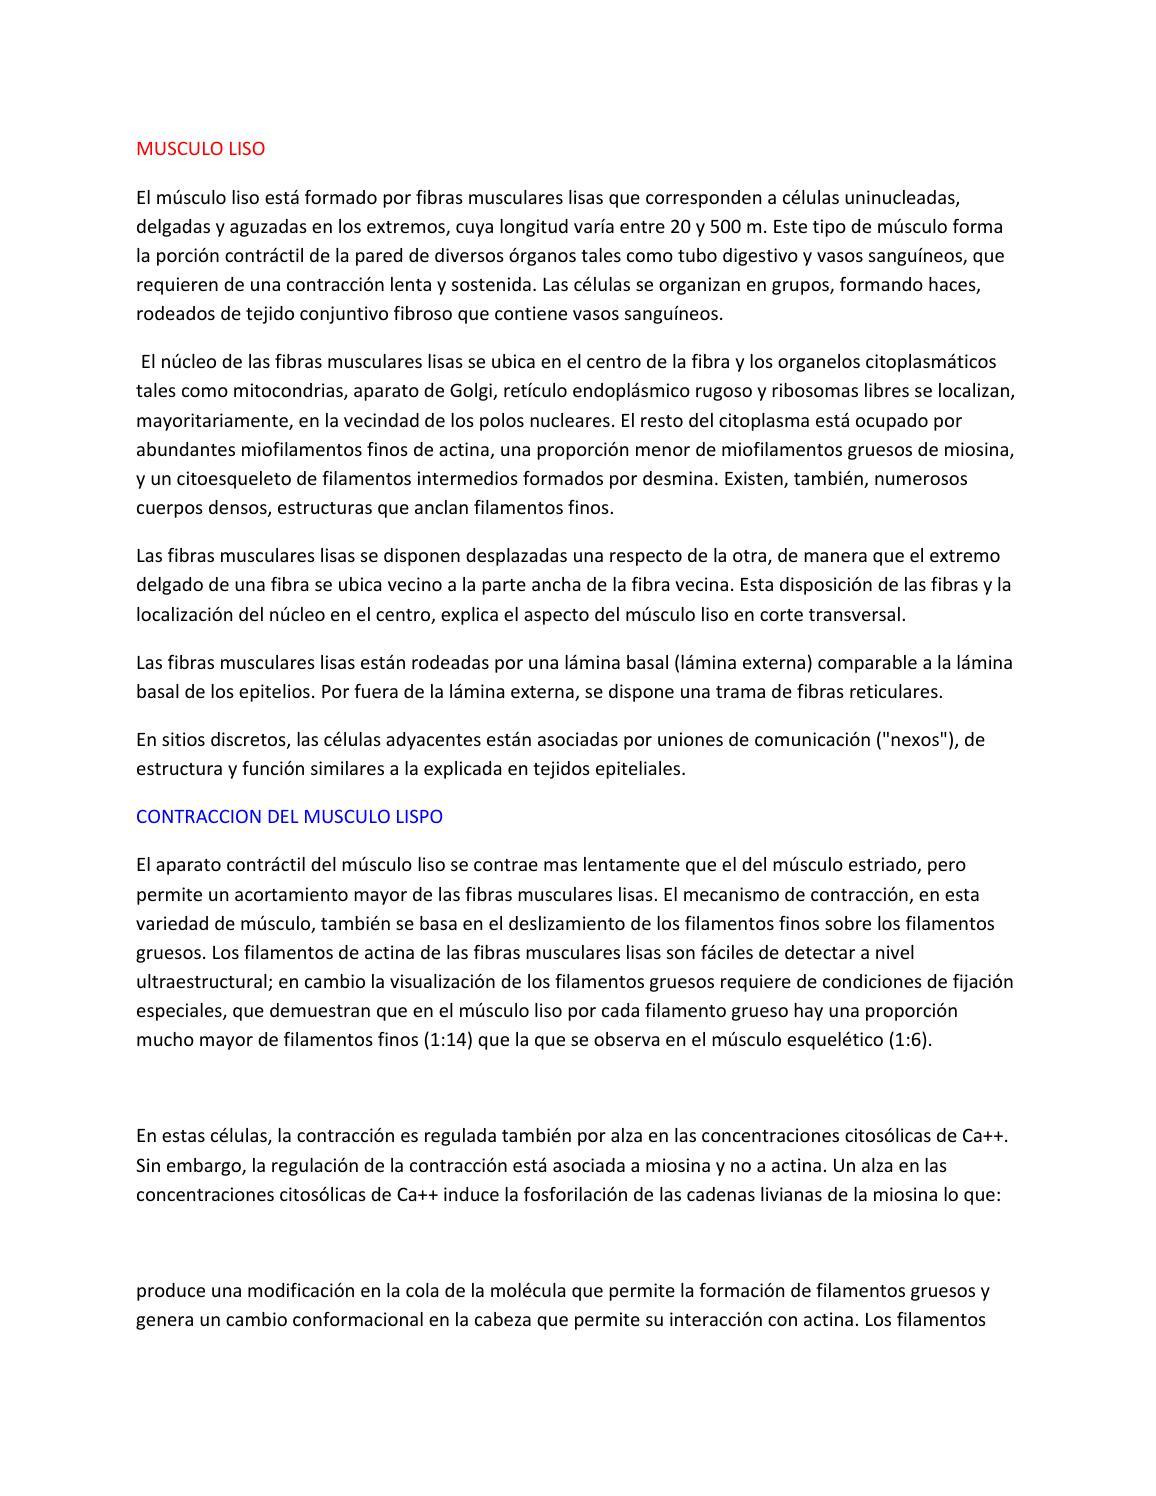 Musculo liso by Kevin Arnulfo España Morales - issuu